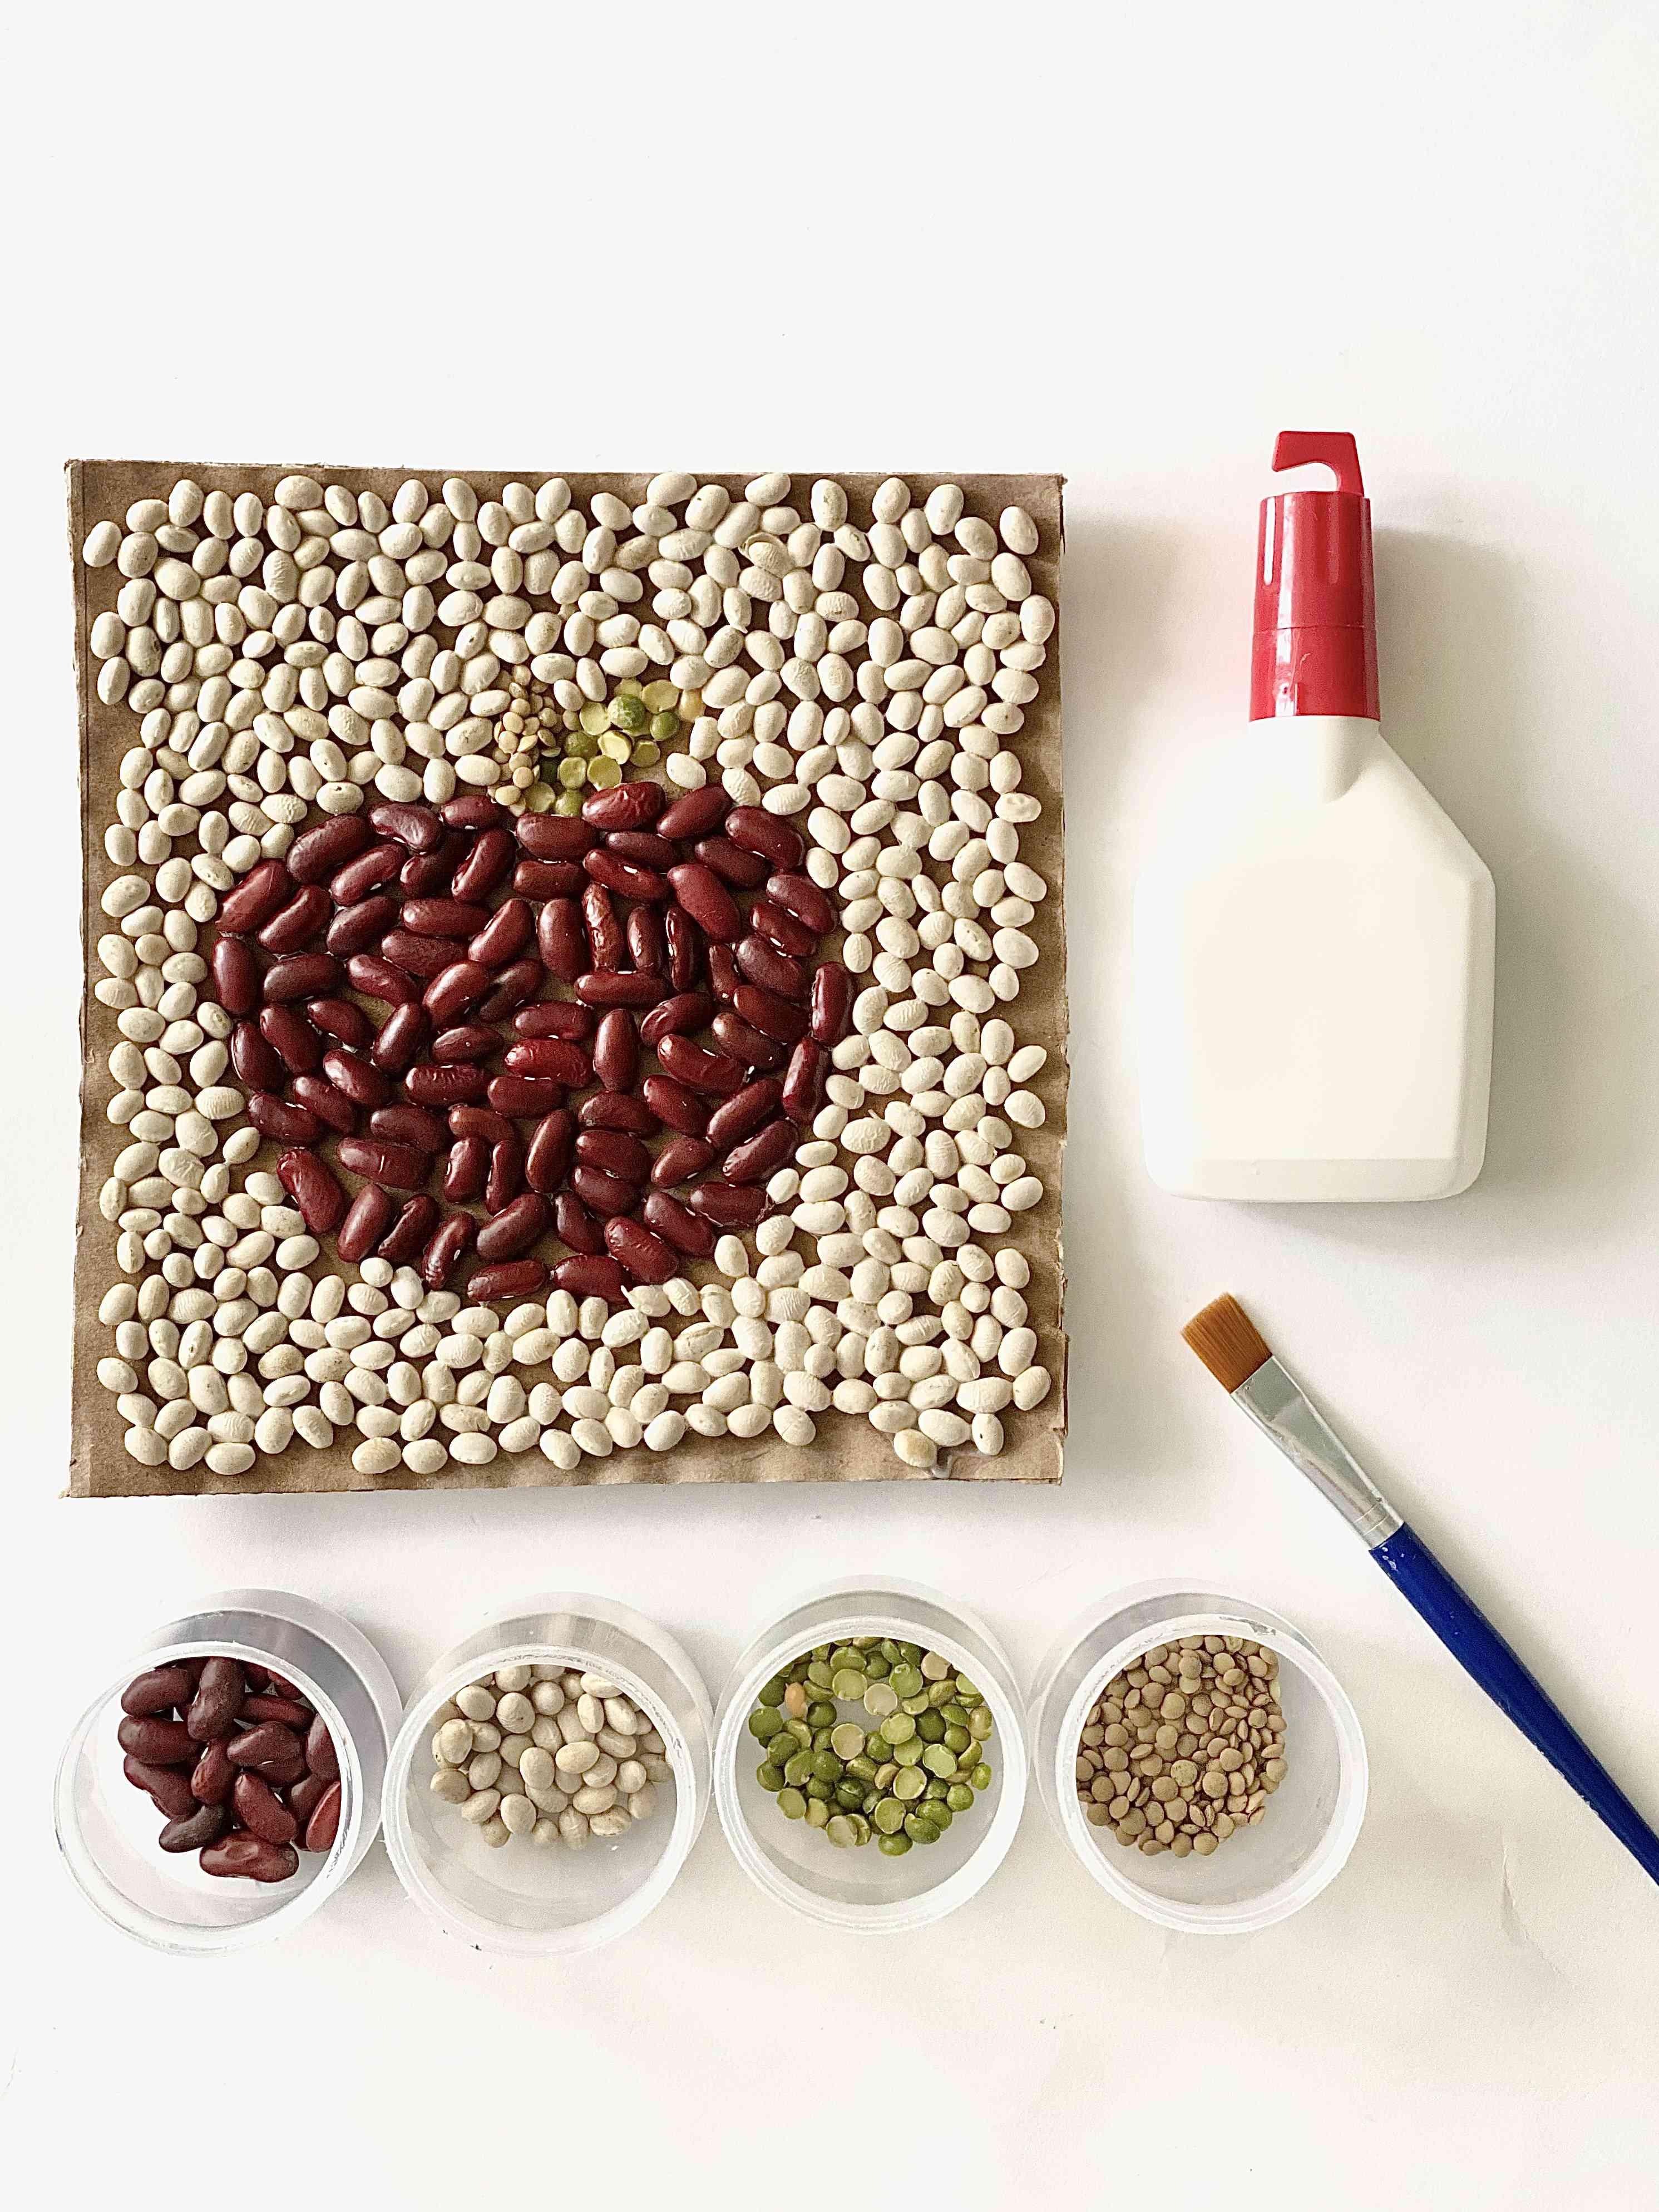 Fall bean mosaic craft with supplies